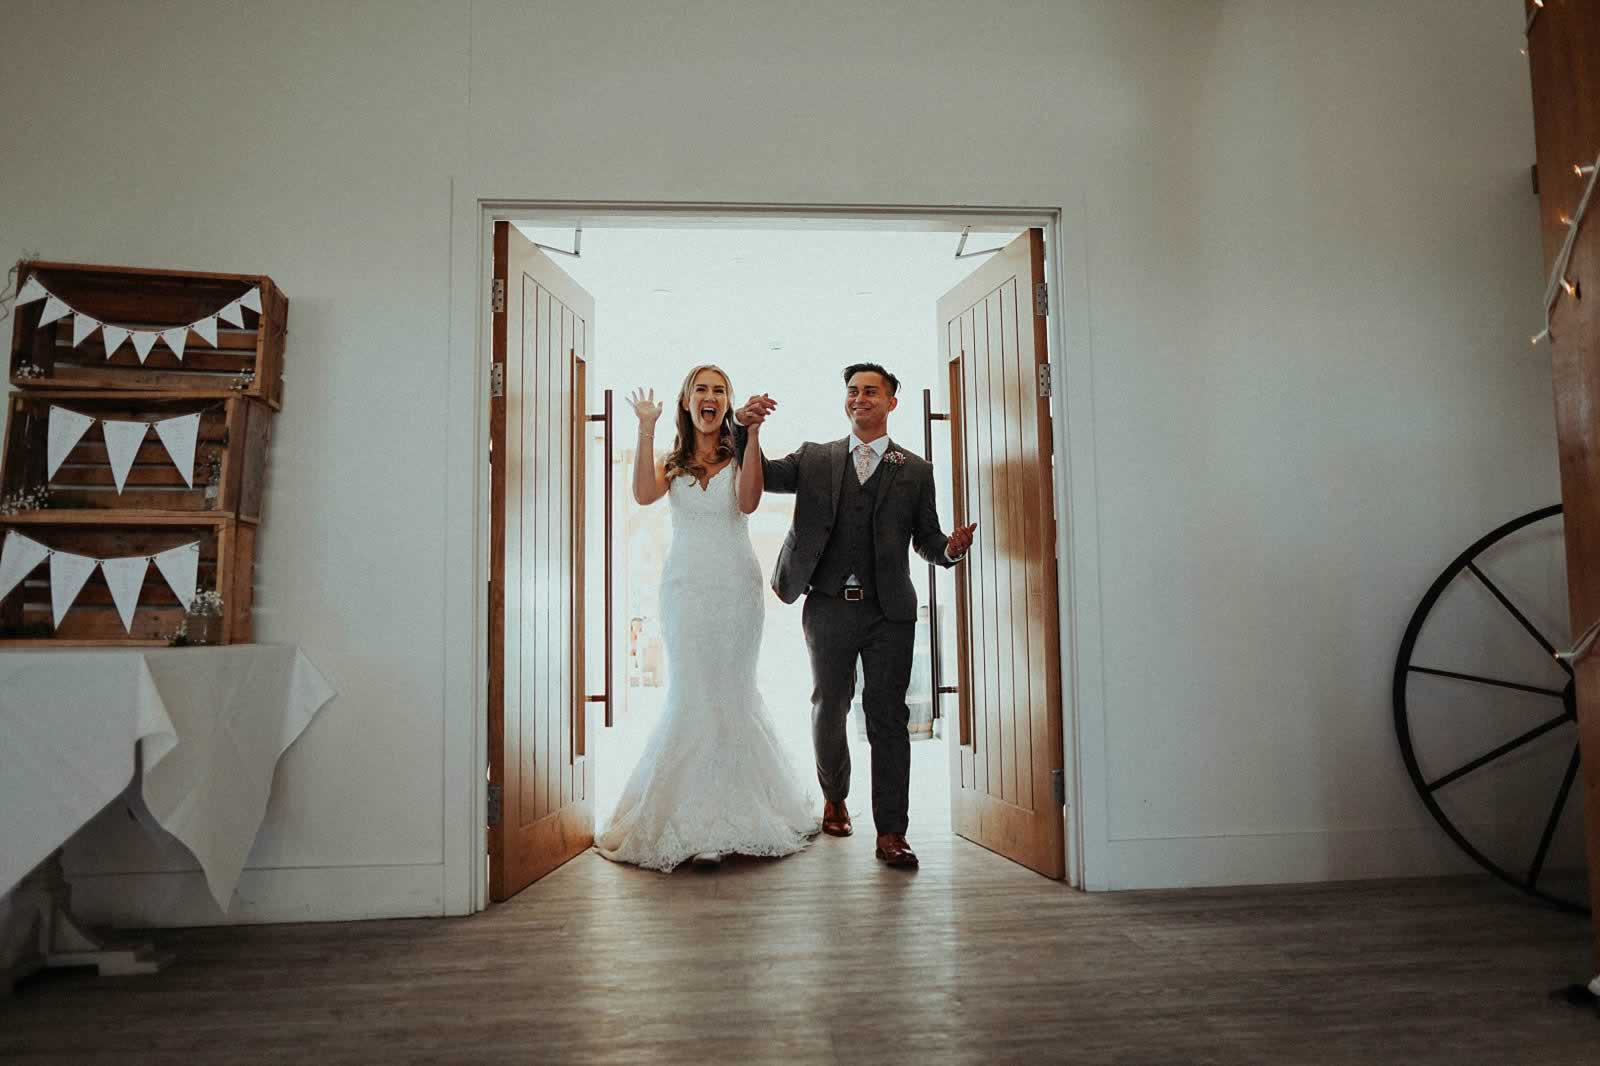 Pryors-Hayes-Wedding-Photography-Barn-Venue-Cheshire-embee-photography-0172.jpg